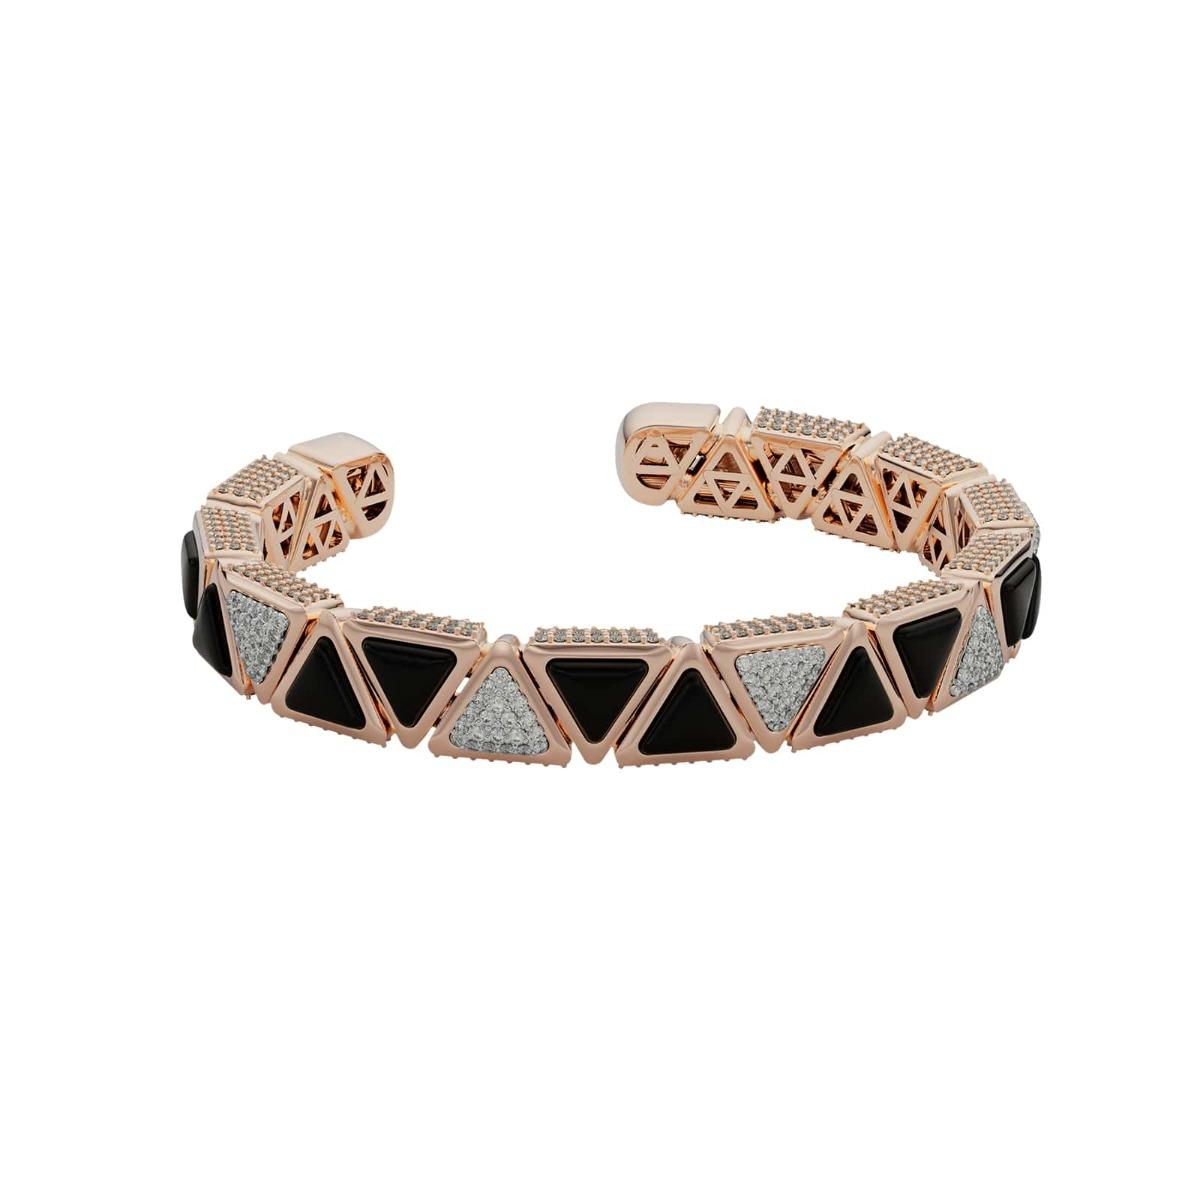 Bracelet BB Mirror Exquisite Rose Gold Onix and Diamonds